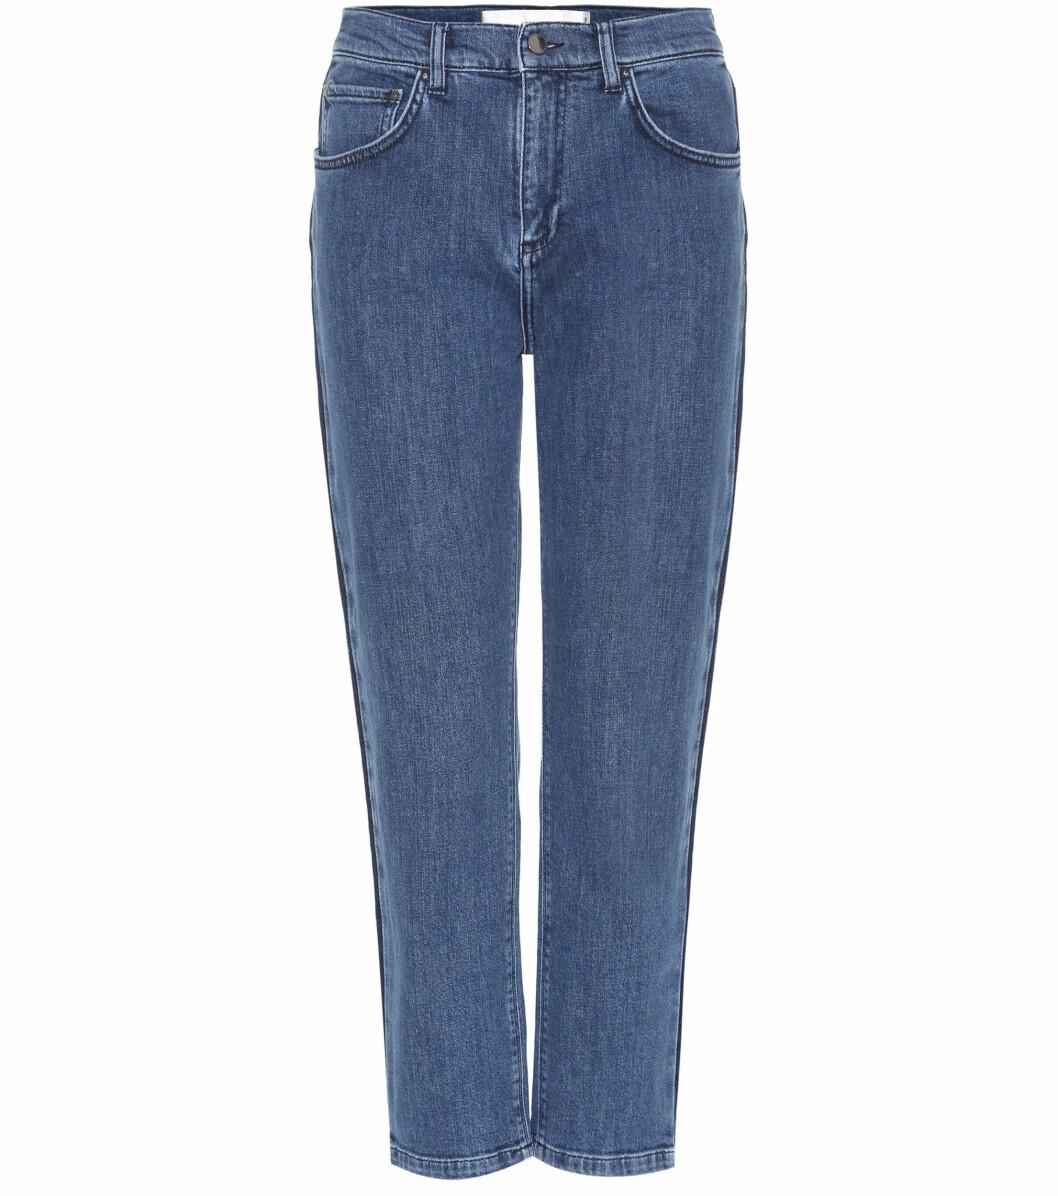 Bukse fra Victoria Beckham via Mytheresa.com | ca. kr 2700 | Foto: Produsenten